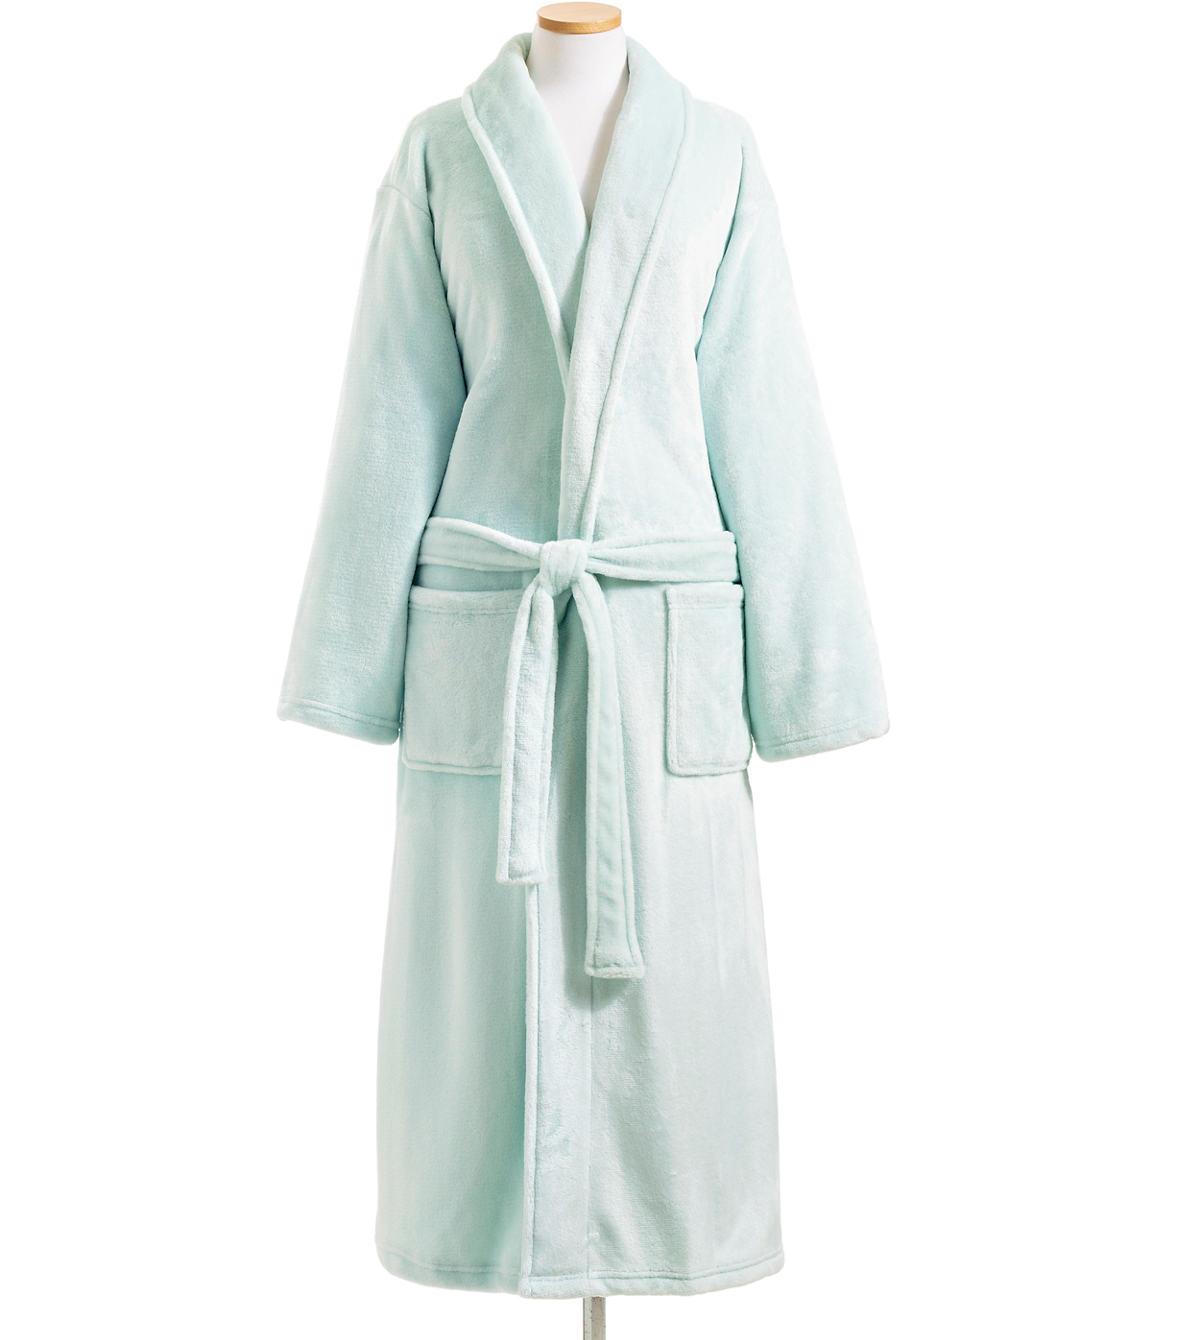 Sheepy Fleece 2.0 Chalk Blue Robe